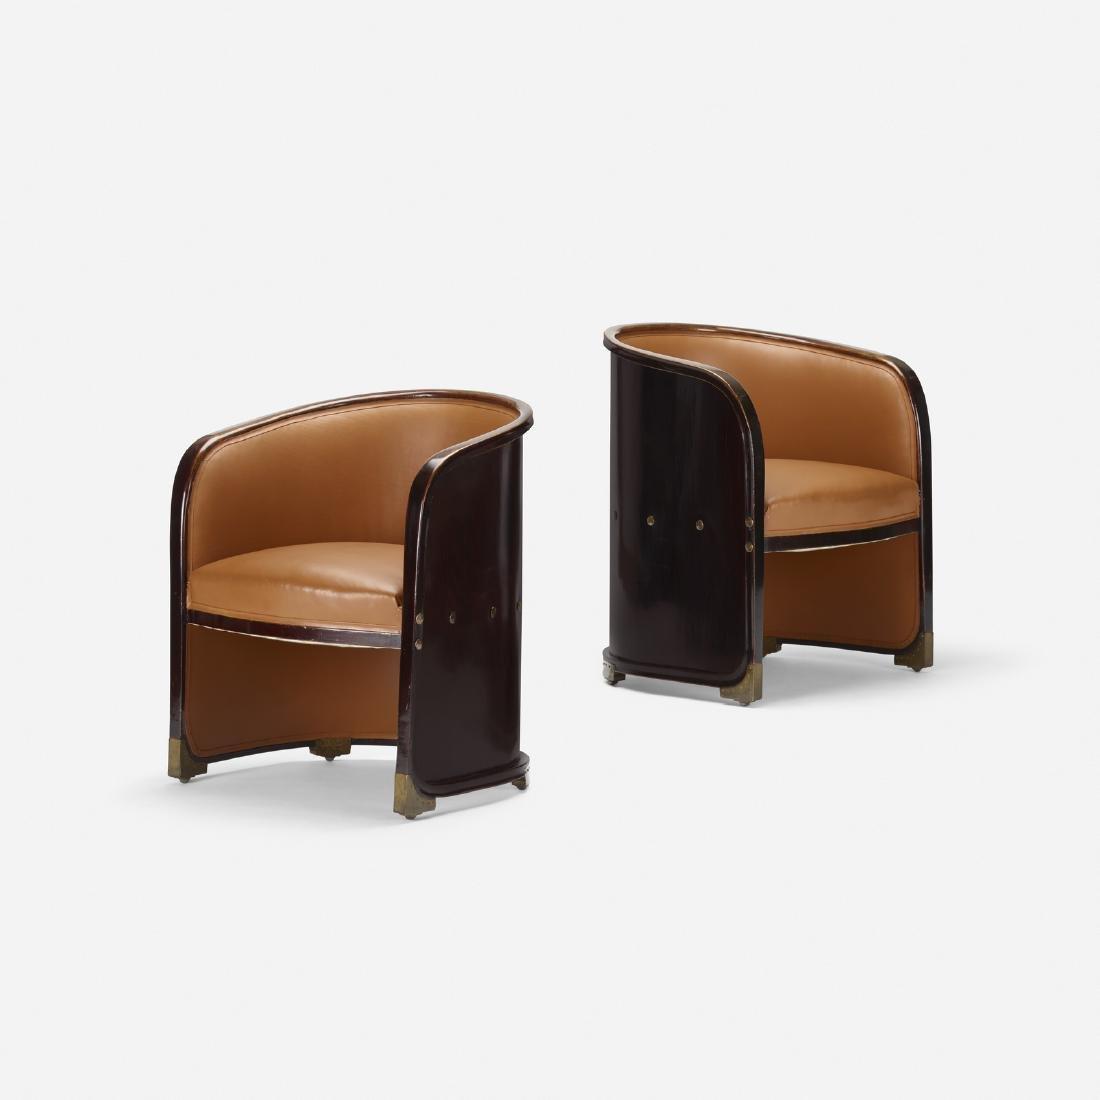 Josef Hoffmann, armchairs model no. 720, pair